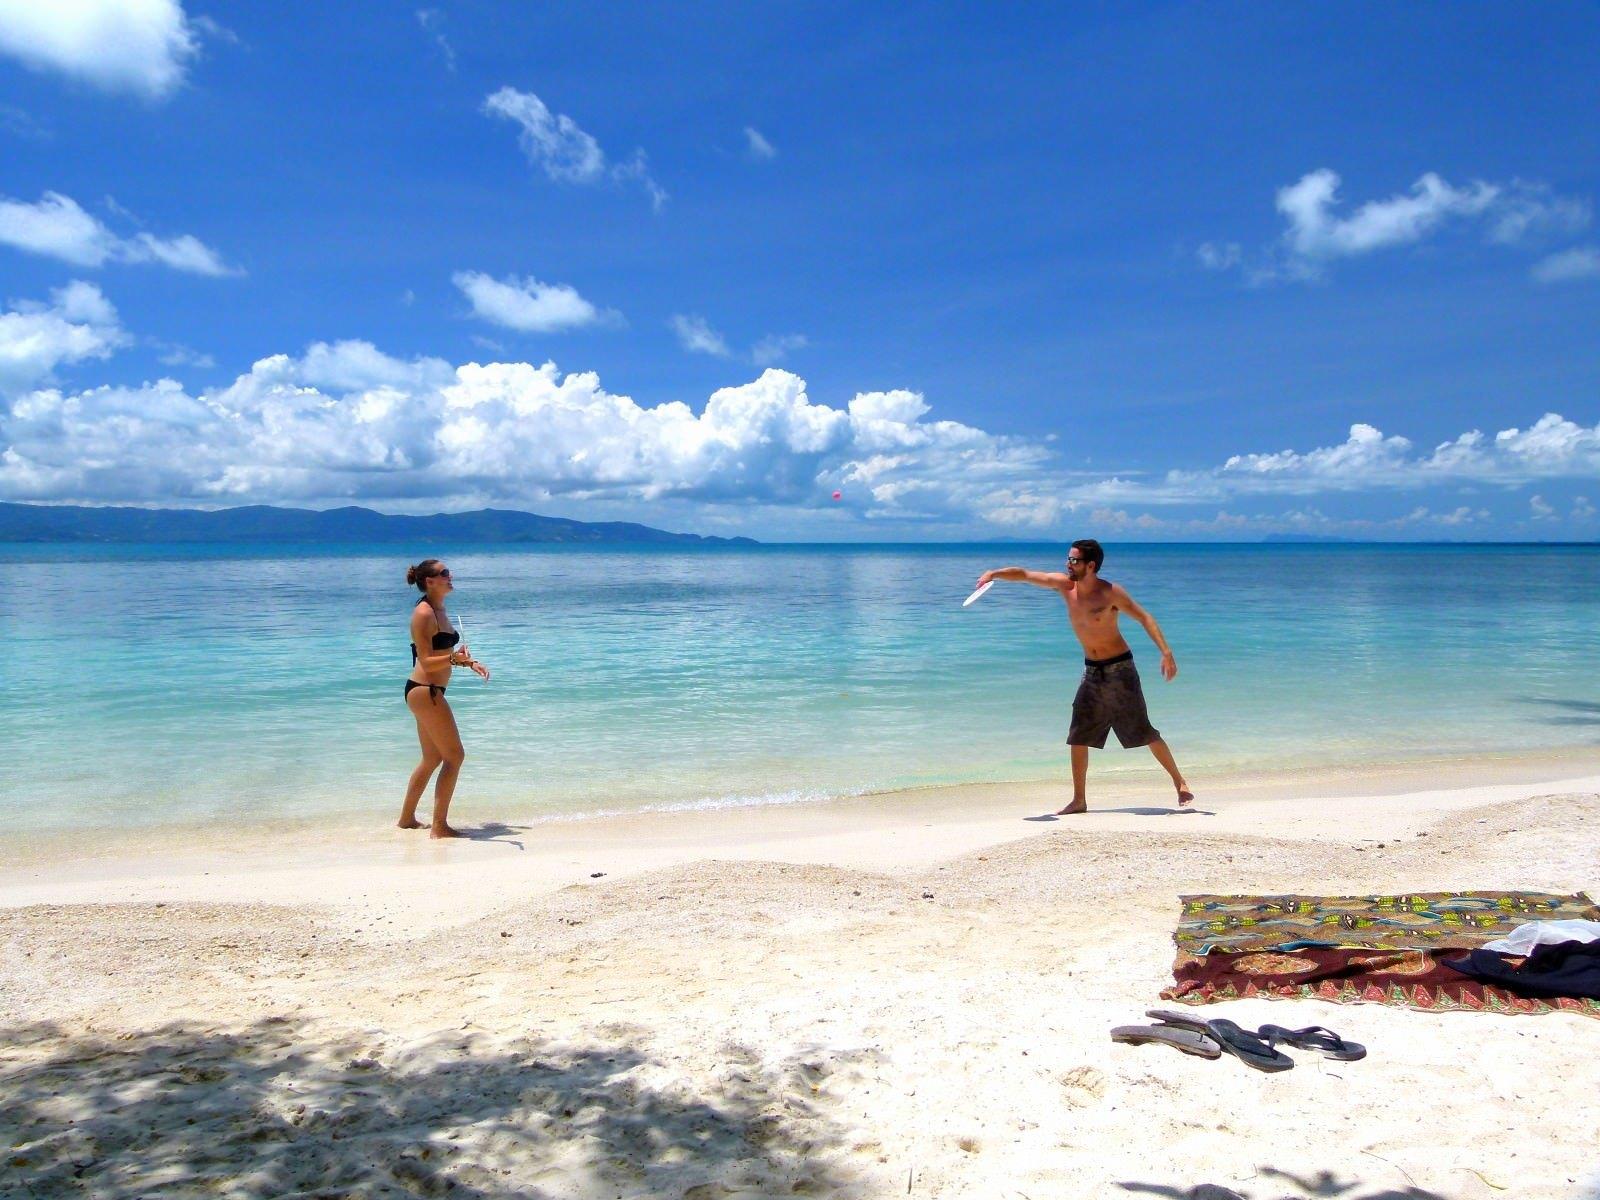 28 Fun Beach Games for Adults & Kids - IcebreakerIdeas